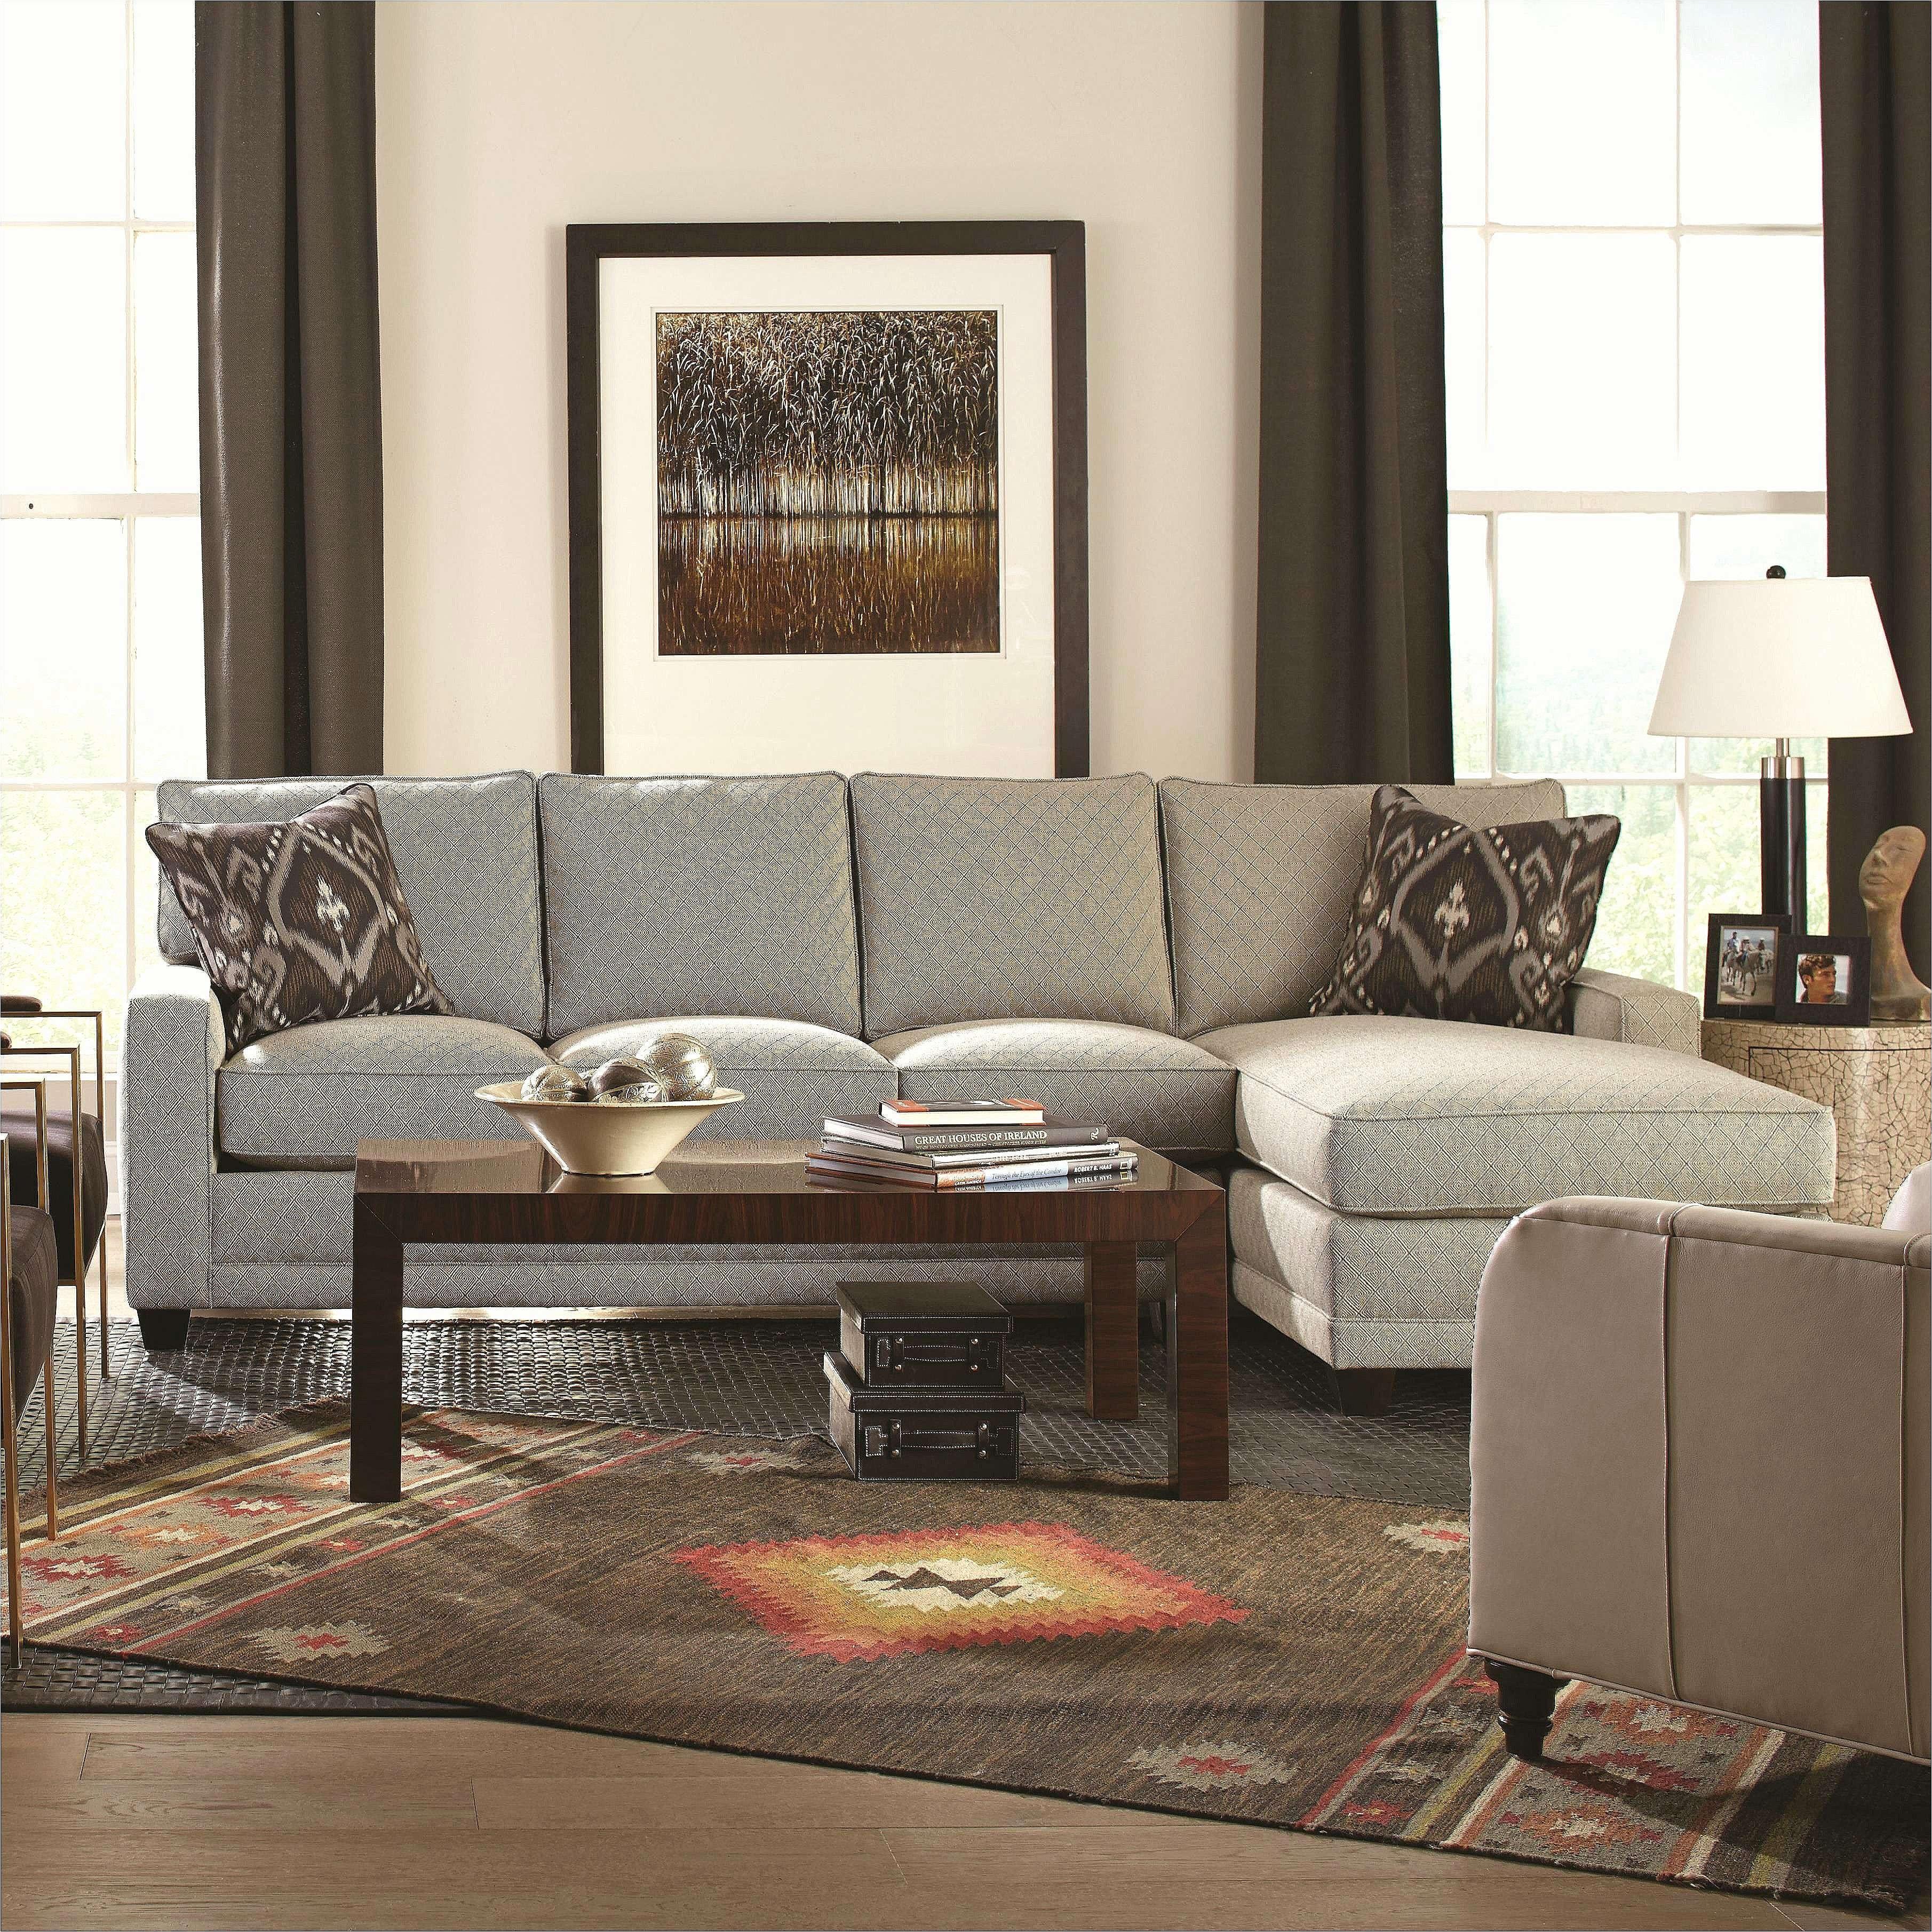 double sofas in living room elegant modern living room furniture new gunstige sofa macys furniture 0d